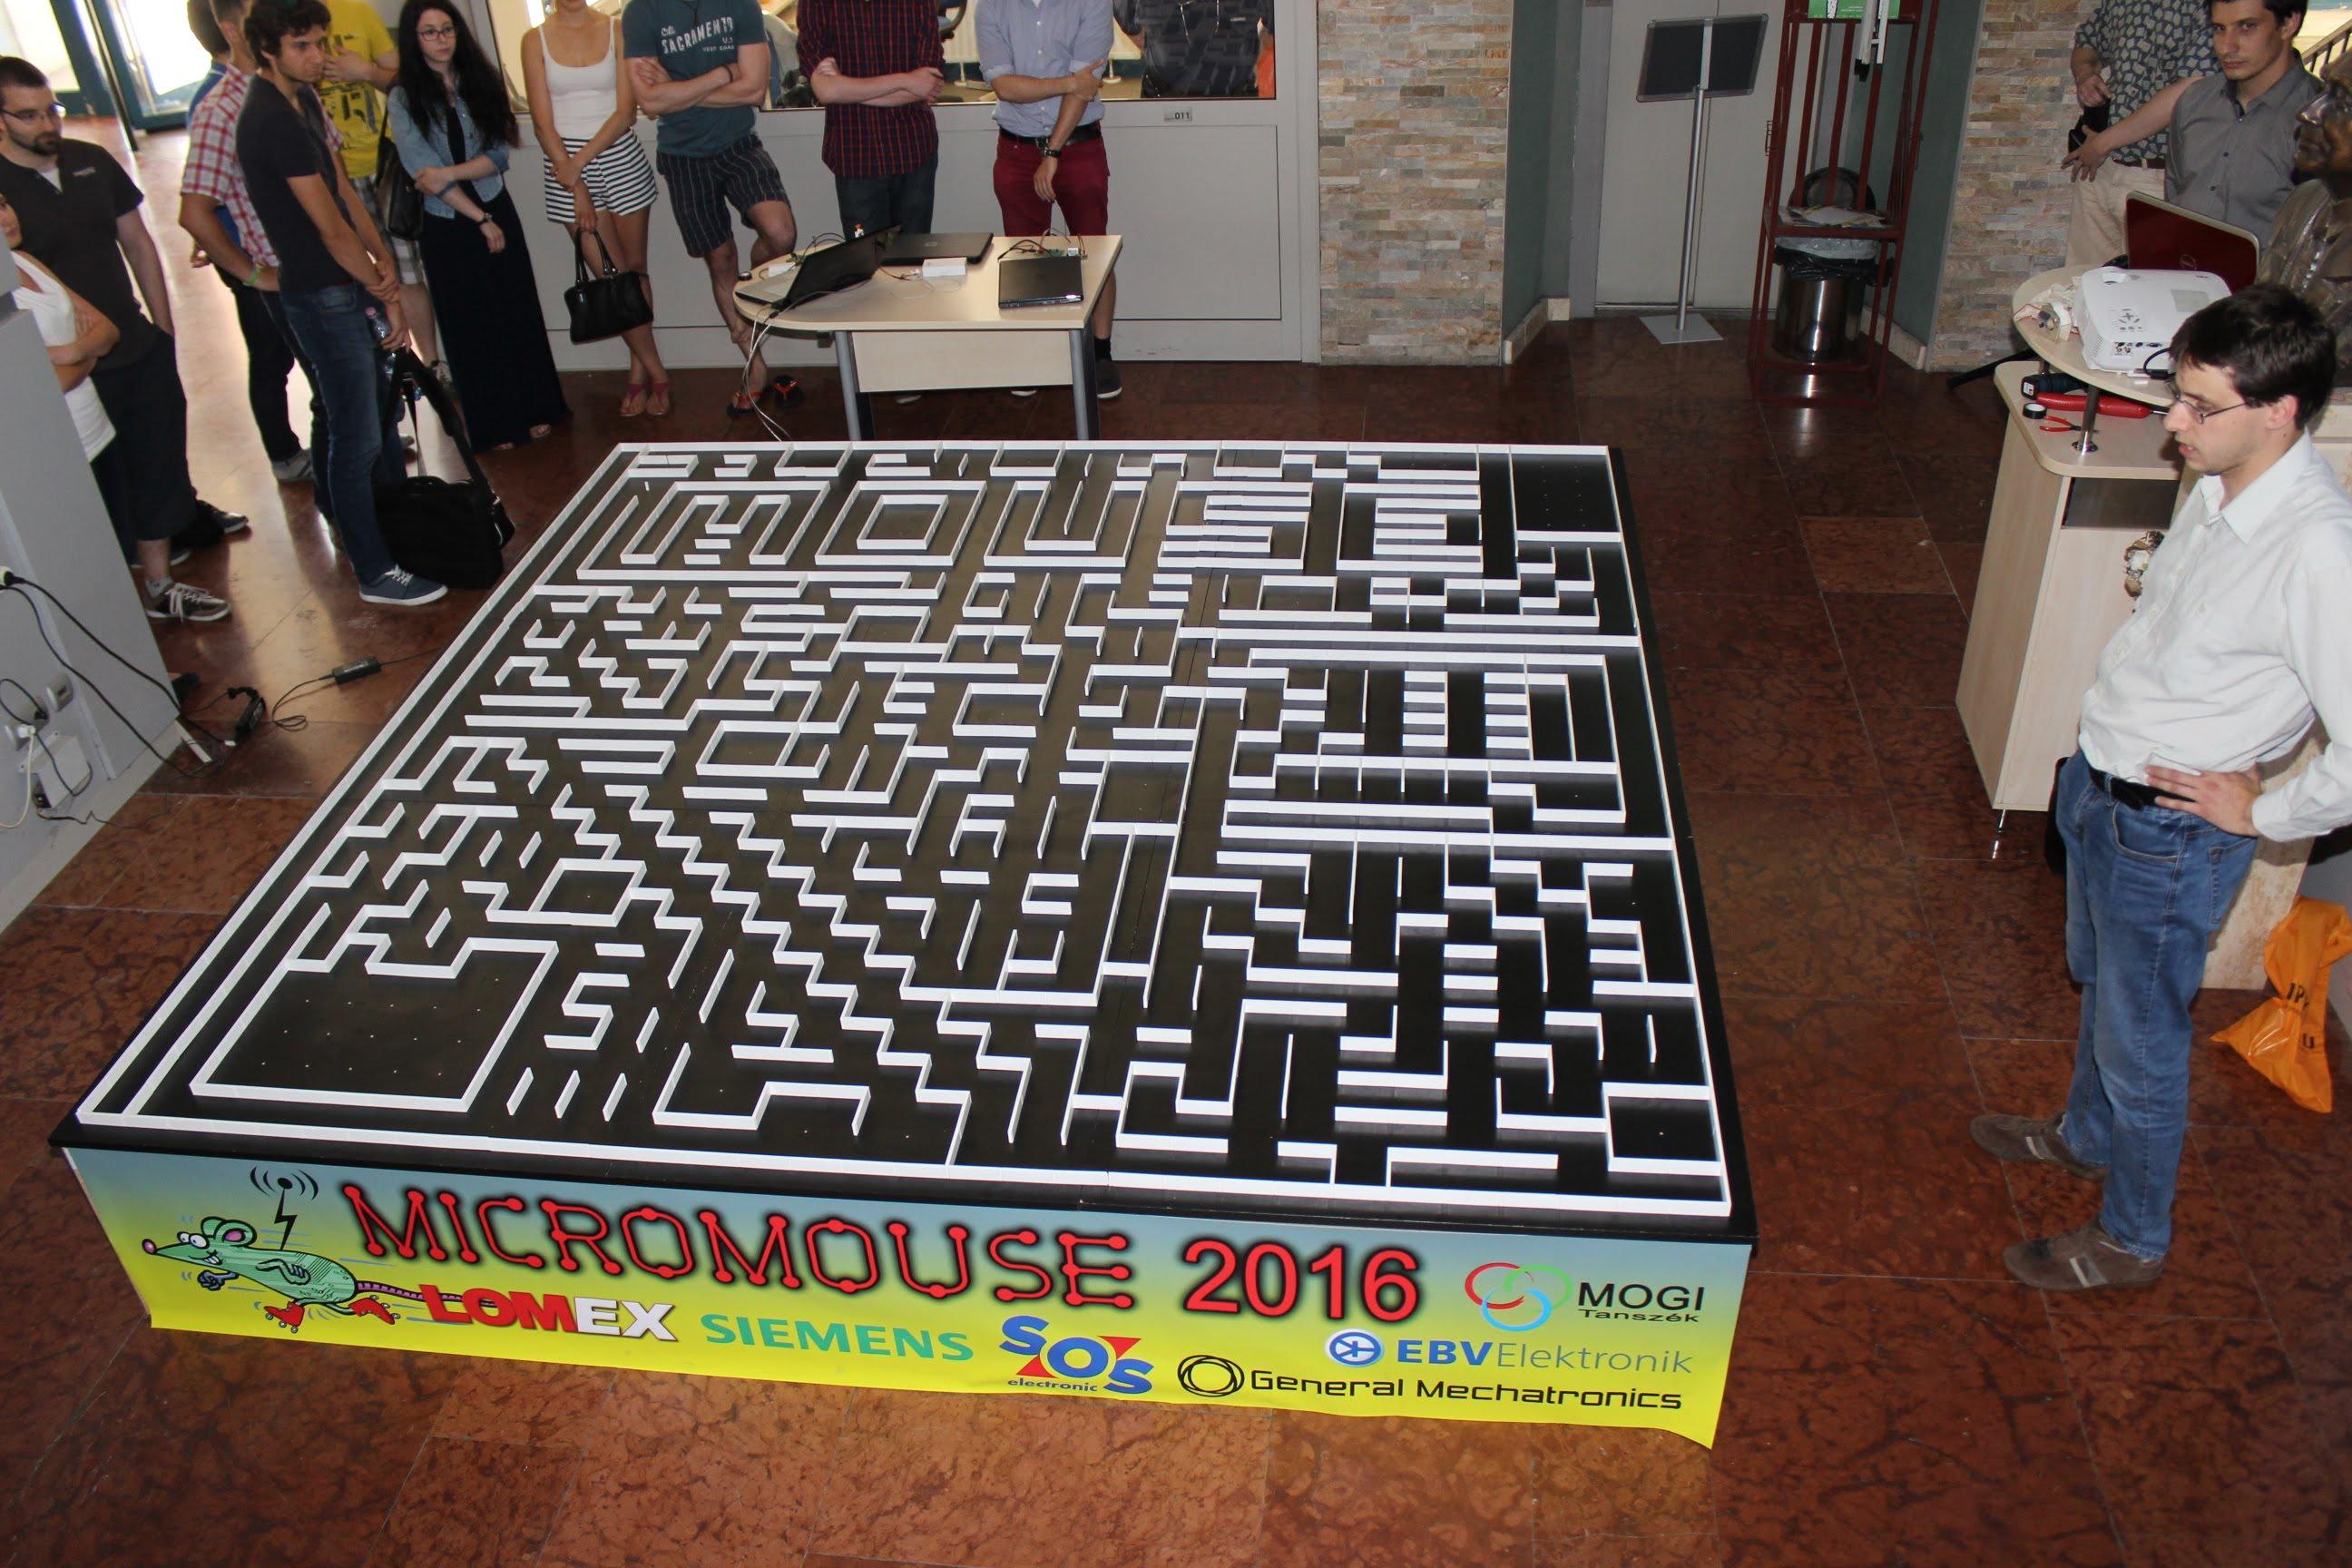 A labirintus